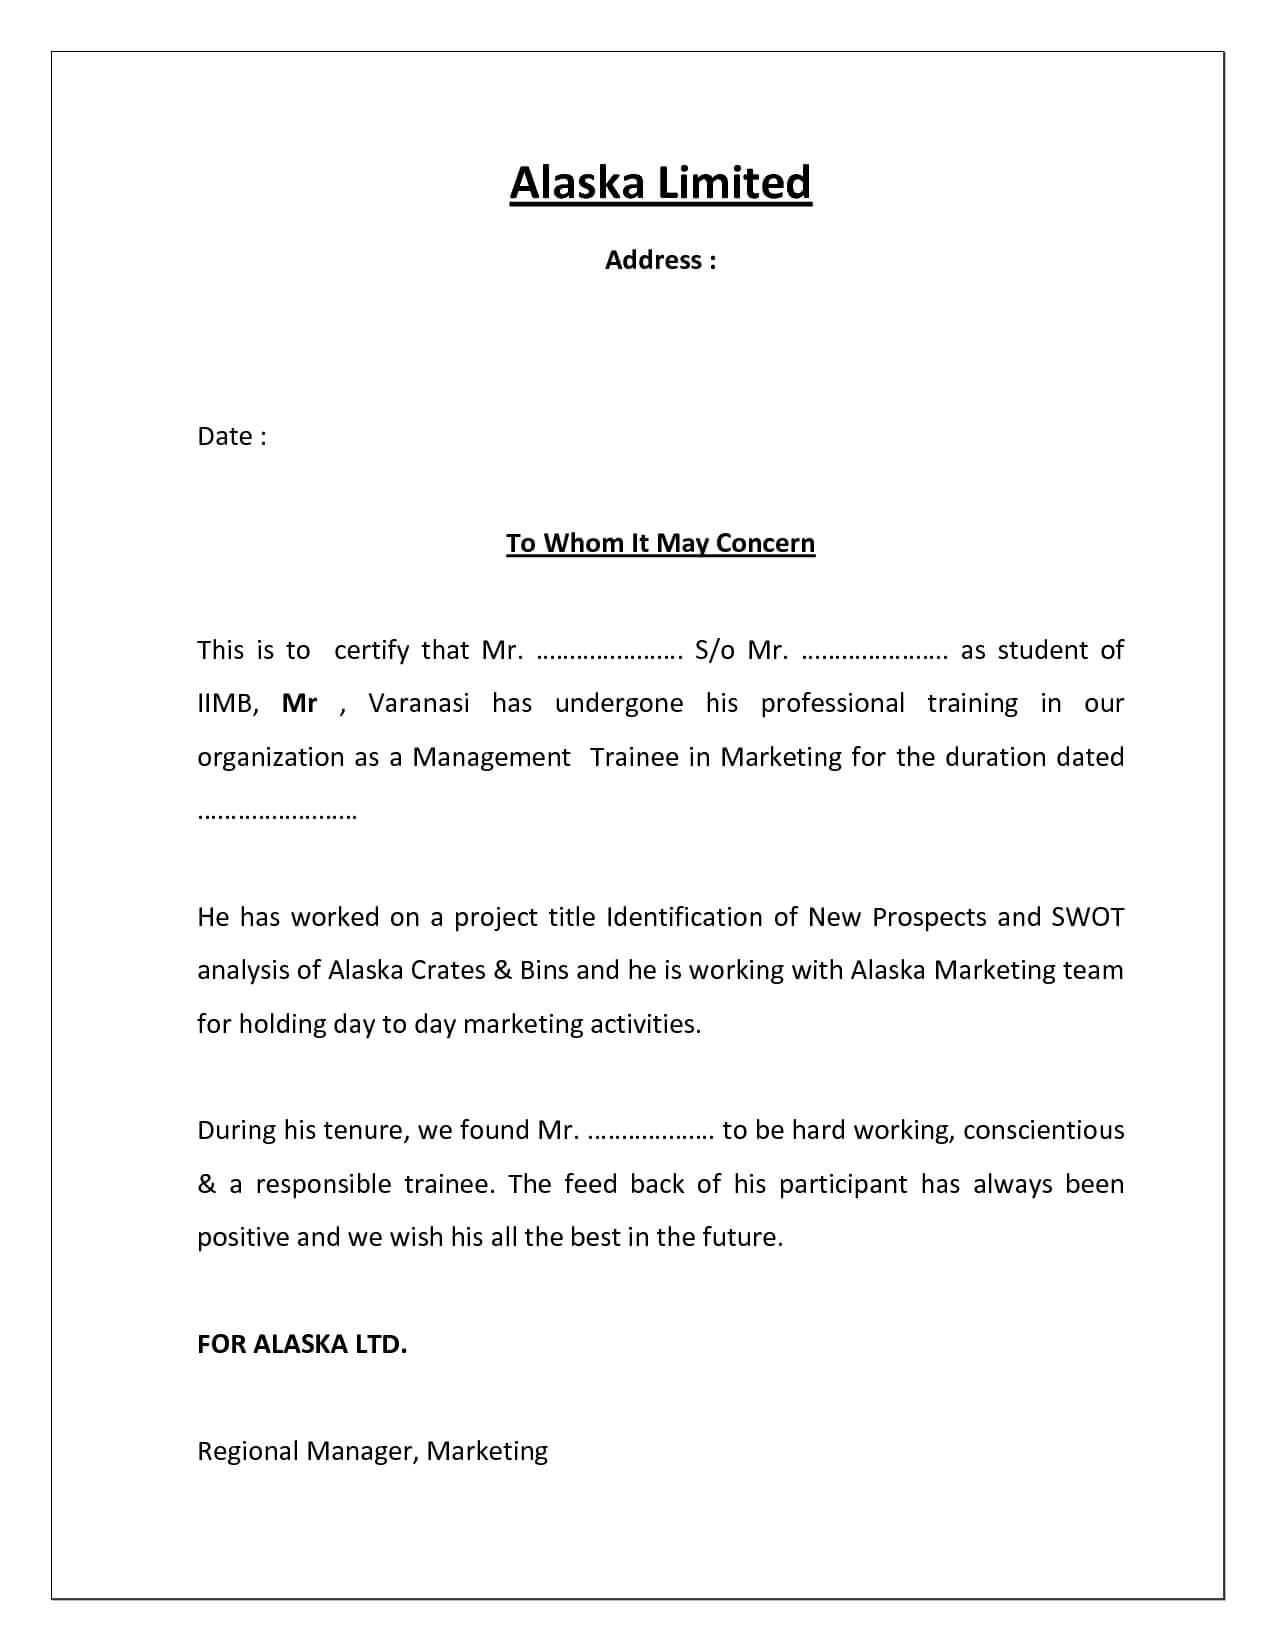 Pinnews Pb On Resume Templates | Lettering, Certificate In Certificate Template For Project Completion